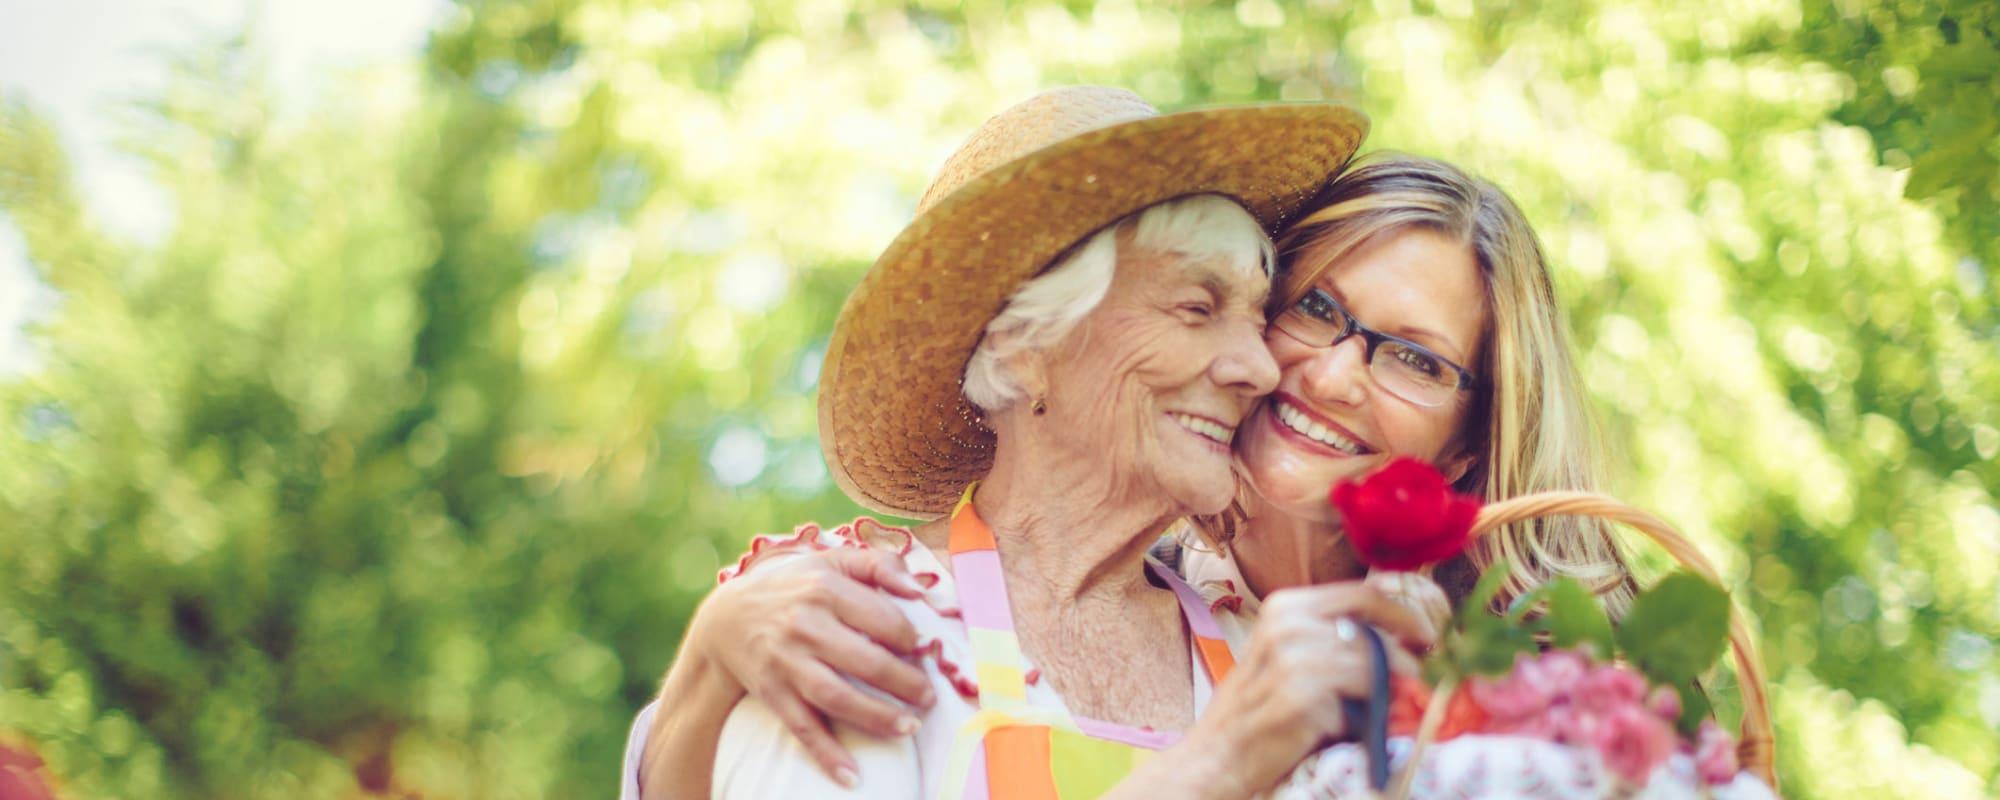 Senior living in Mount Dora, Florida at CERTUS Premier Memory Care Living.